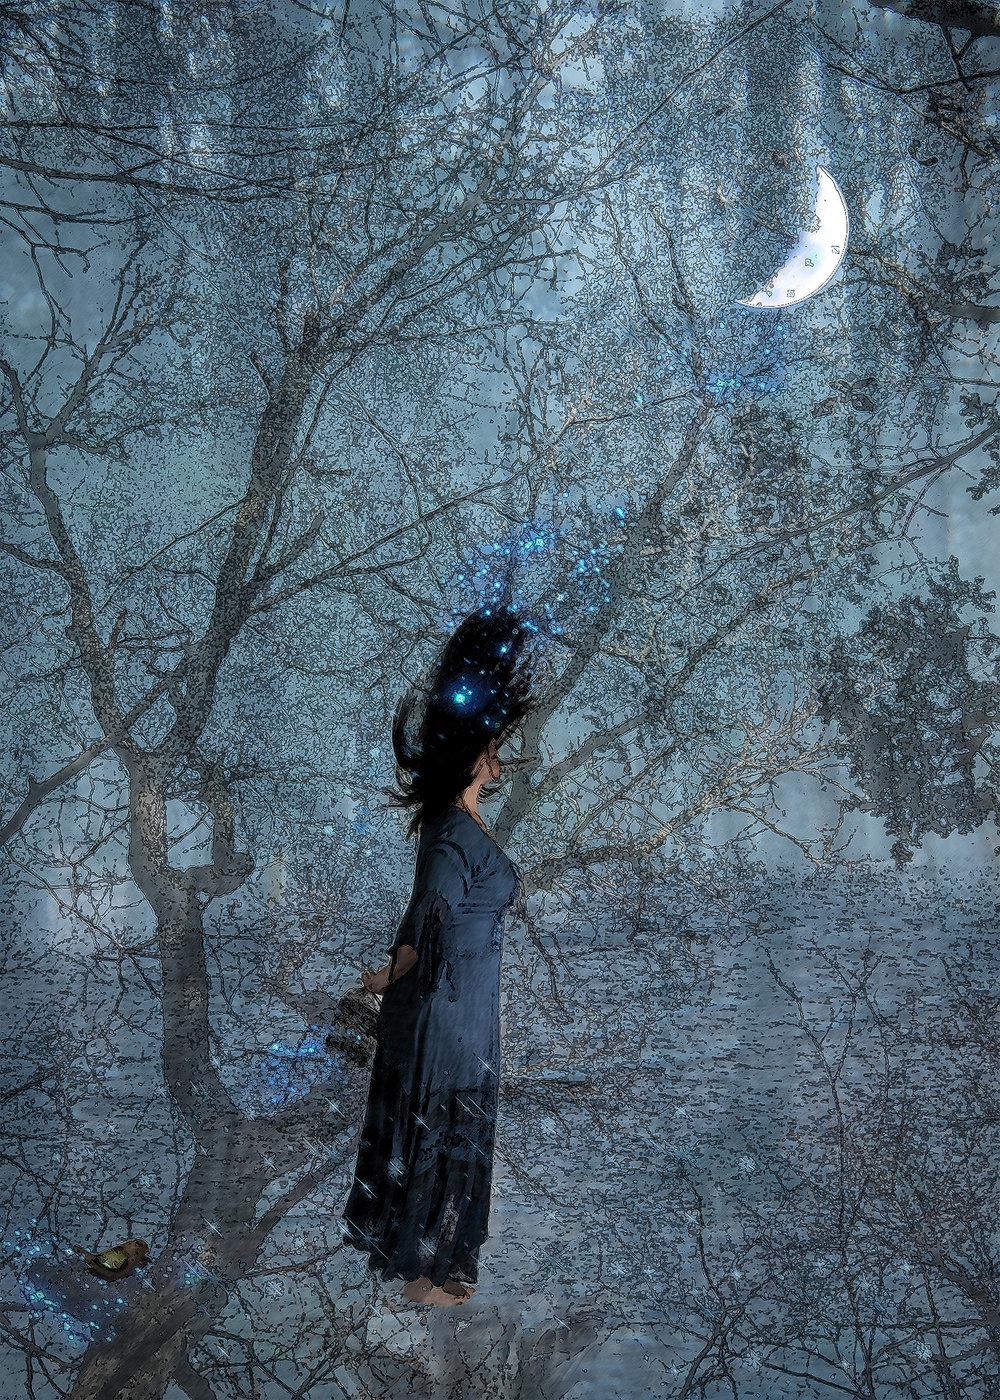 Moon Gurl - MODEL | Self-ScrutinyThe 2k16 National Latin American BiennialThe Loisaida GalleryNew York, NY November 2k16